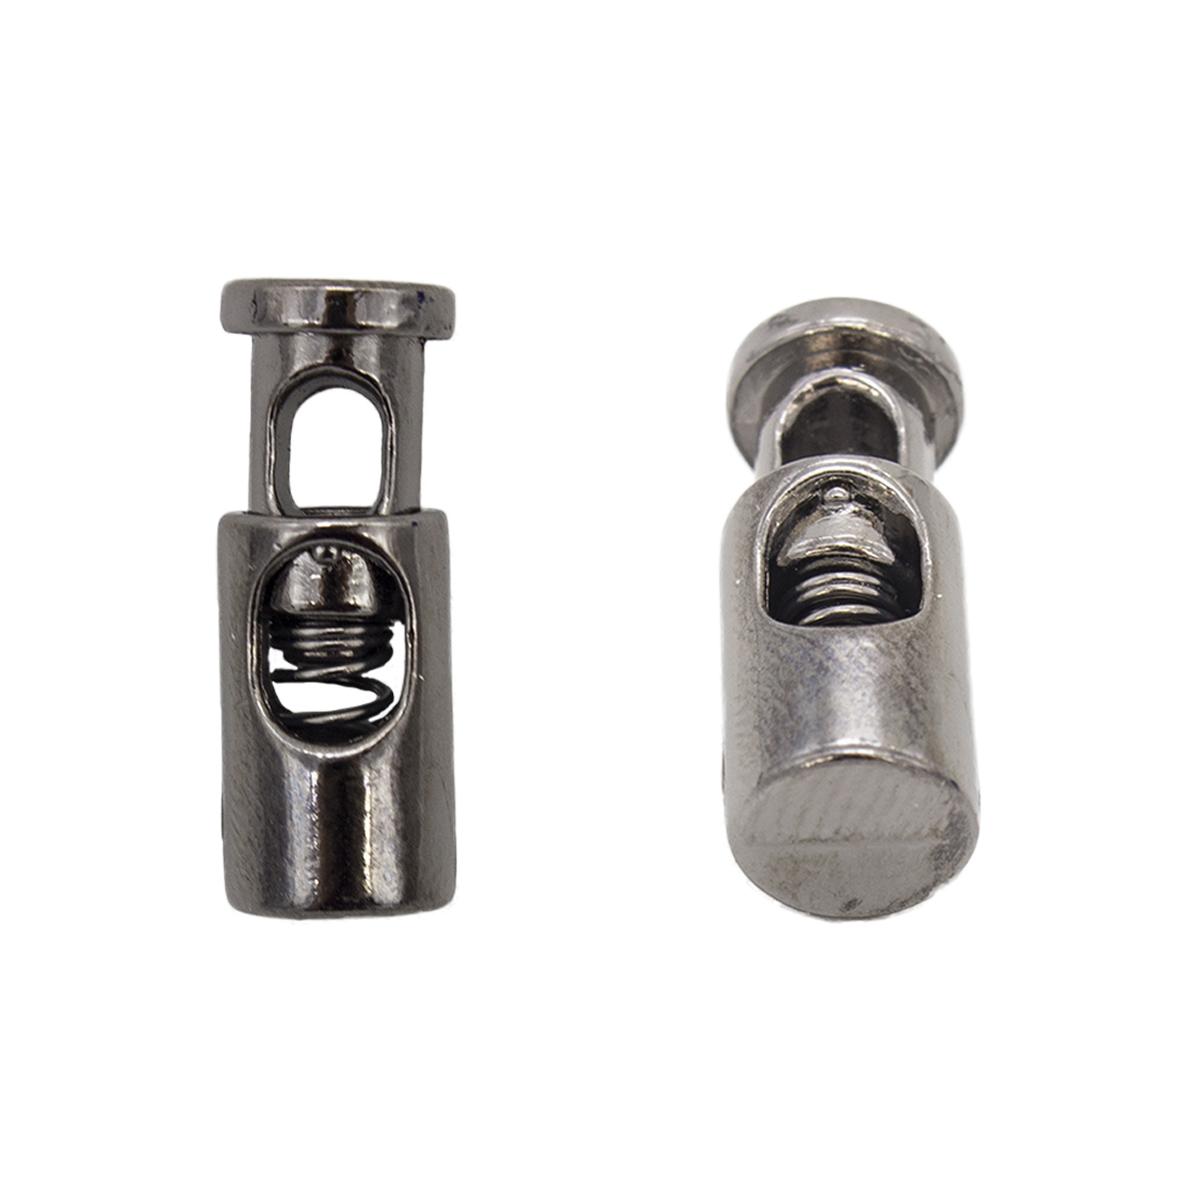 0305-5033 Стопор 'Цилиндр' d=3,5мм, 20*8мм, 4шт, металл Hobby&Pro